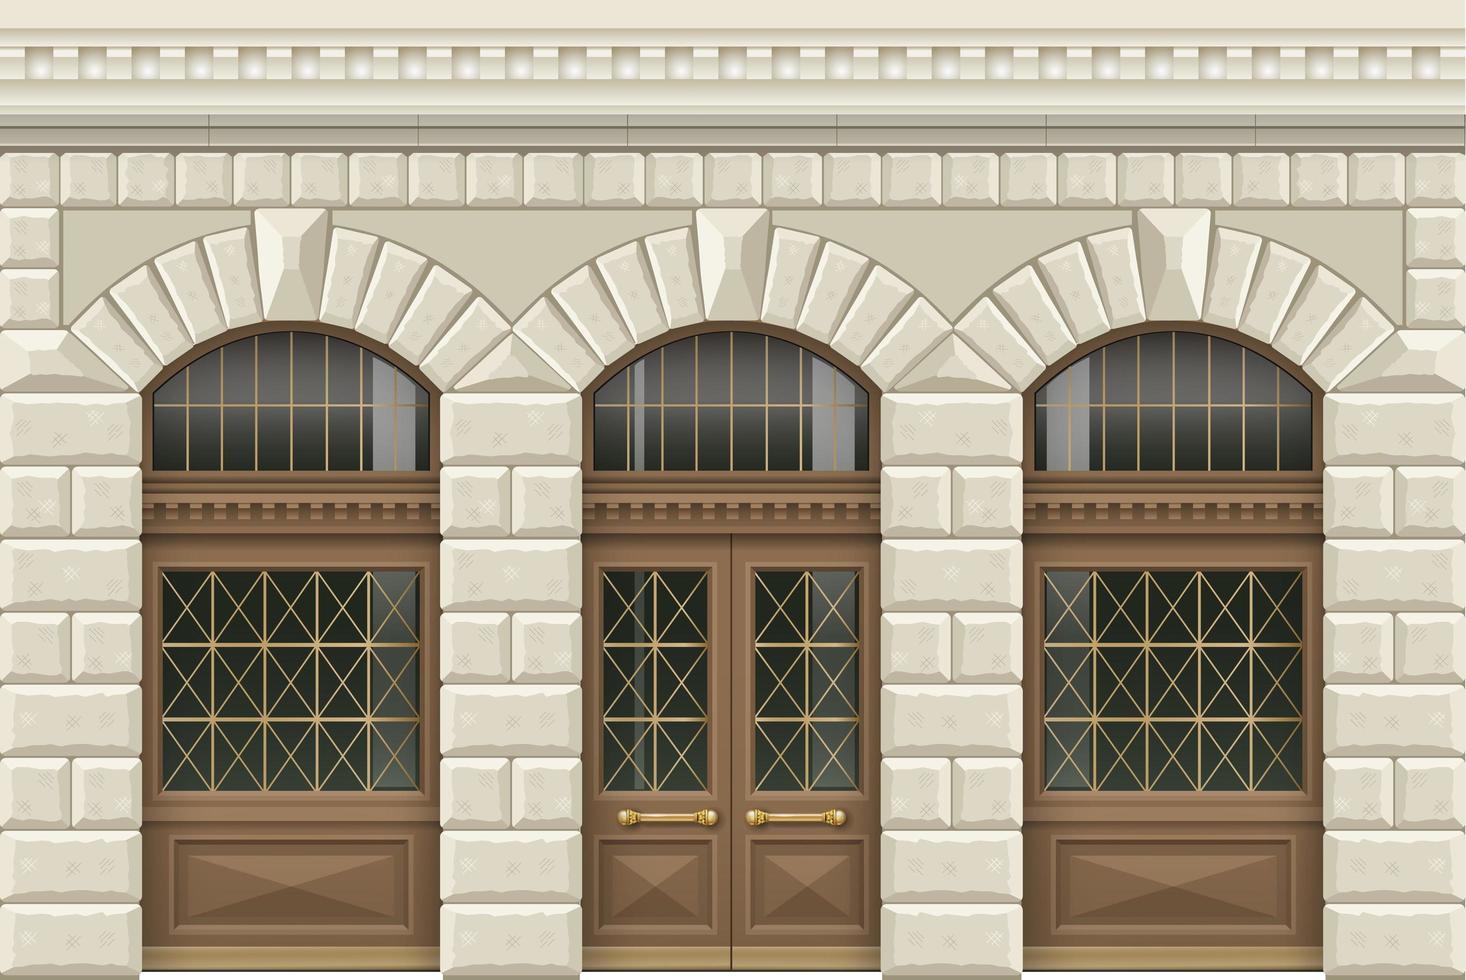 klassische Fassade im Retro-Stil vektor